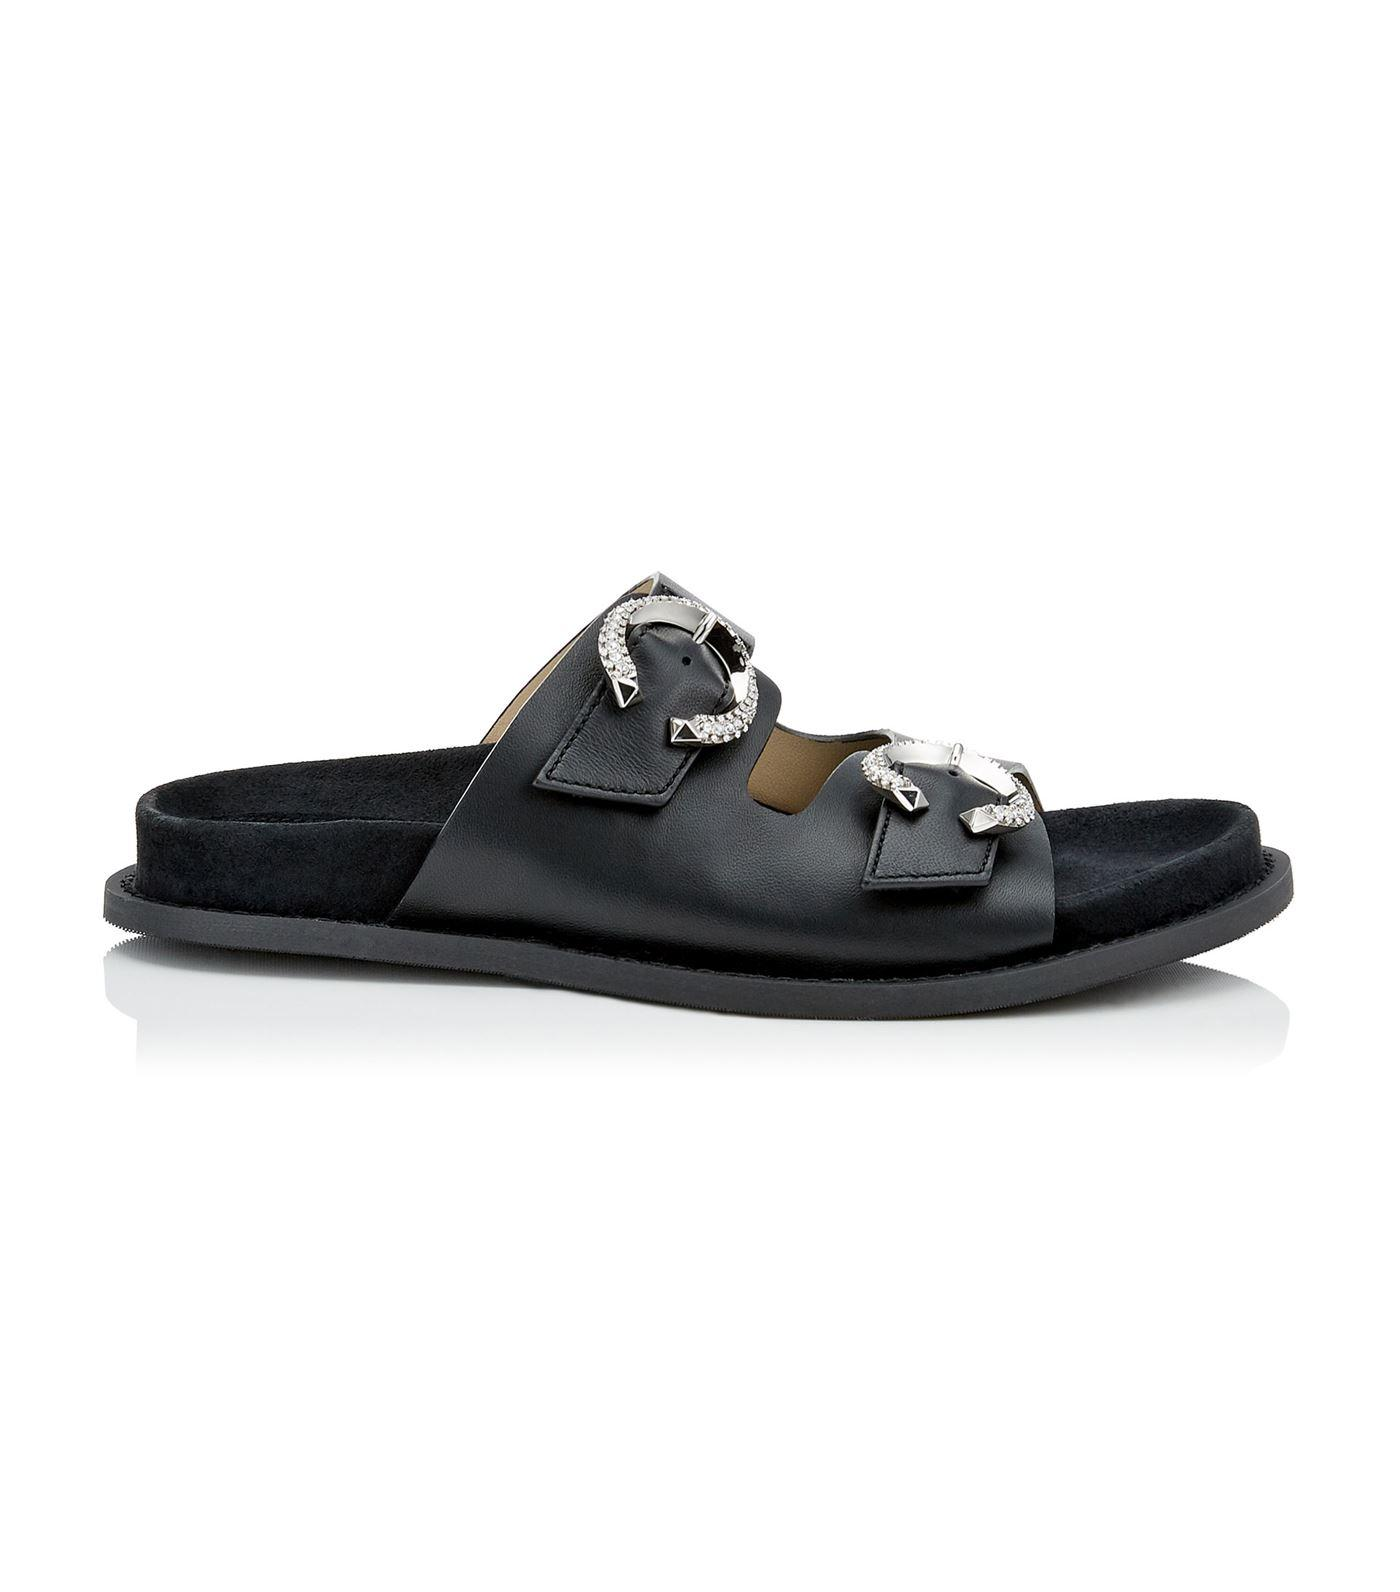 fab0ef6144e Lyst - Jimmy Choo Acer Nappa Buckled Flats in Black